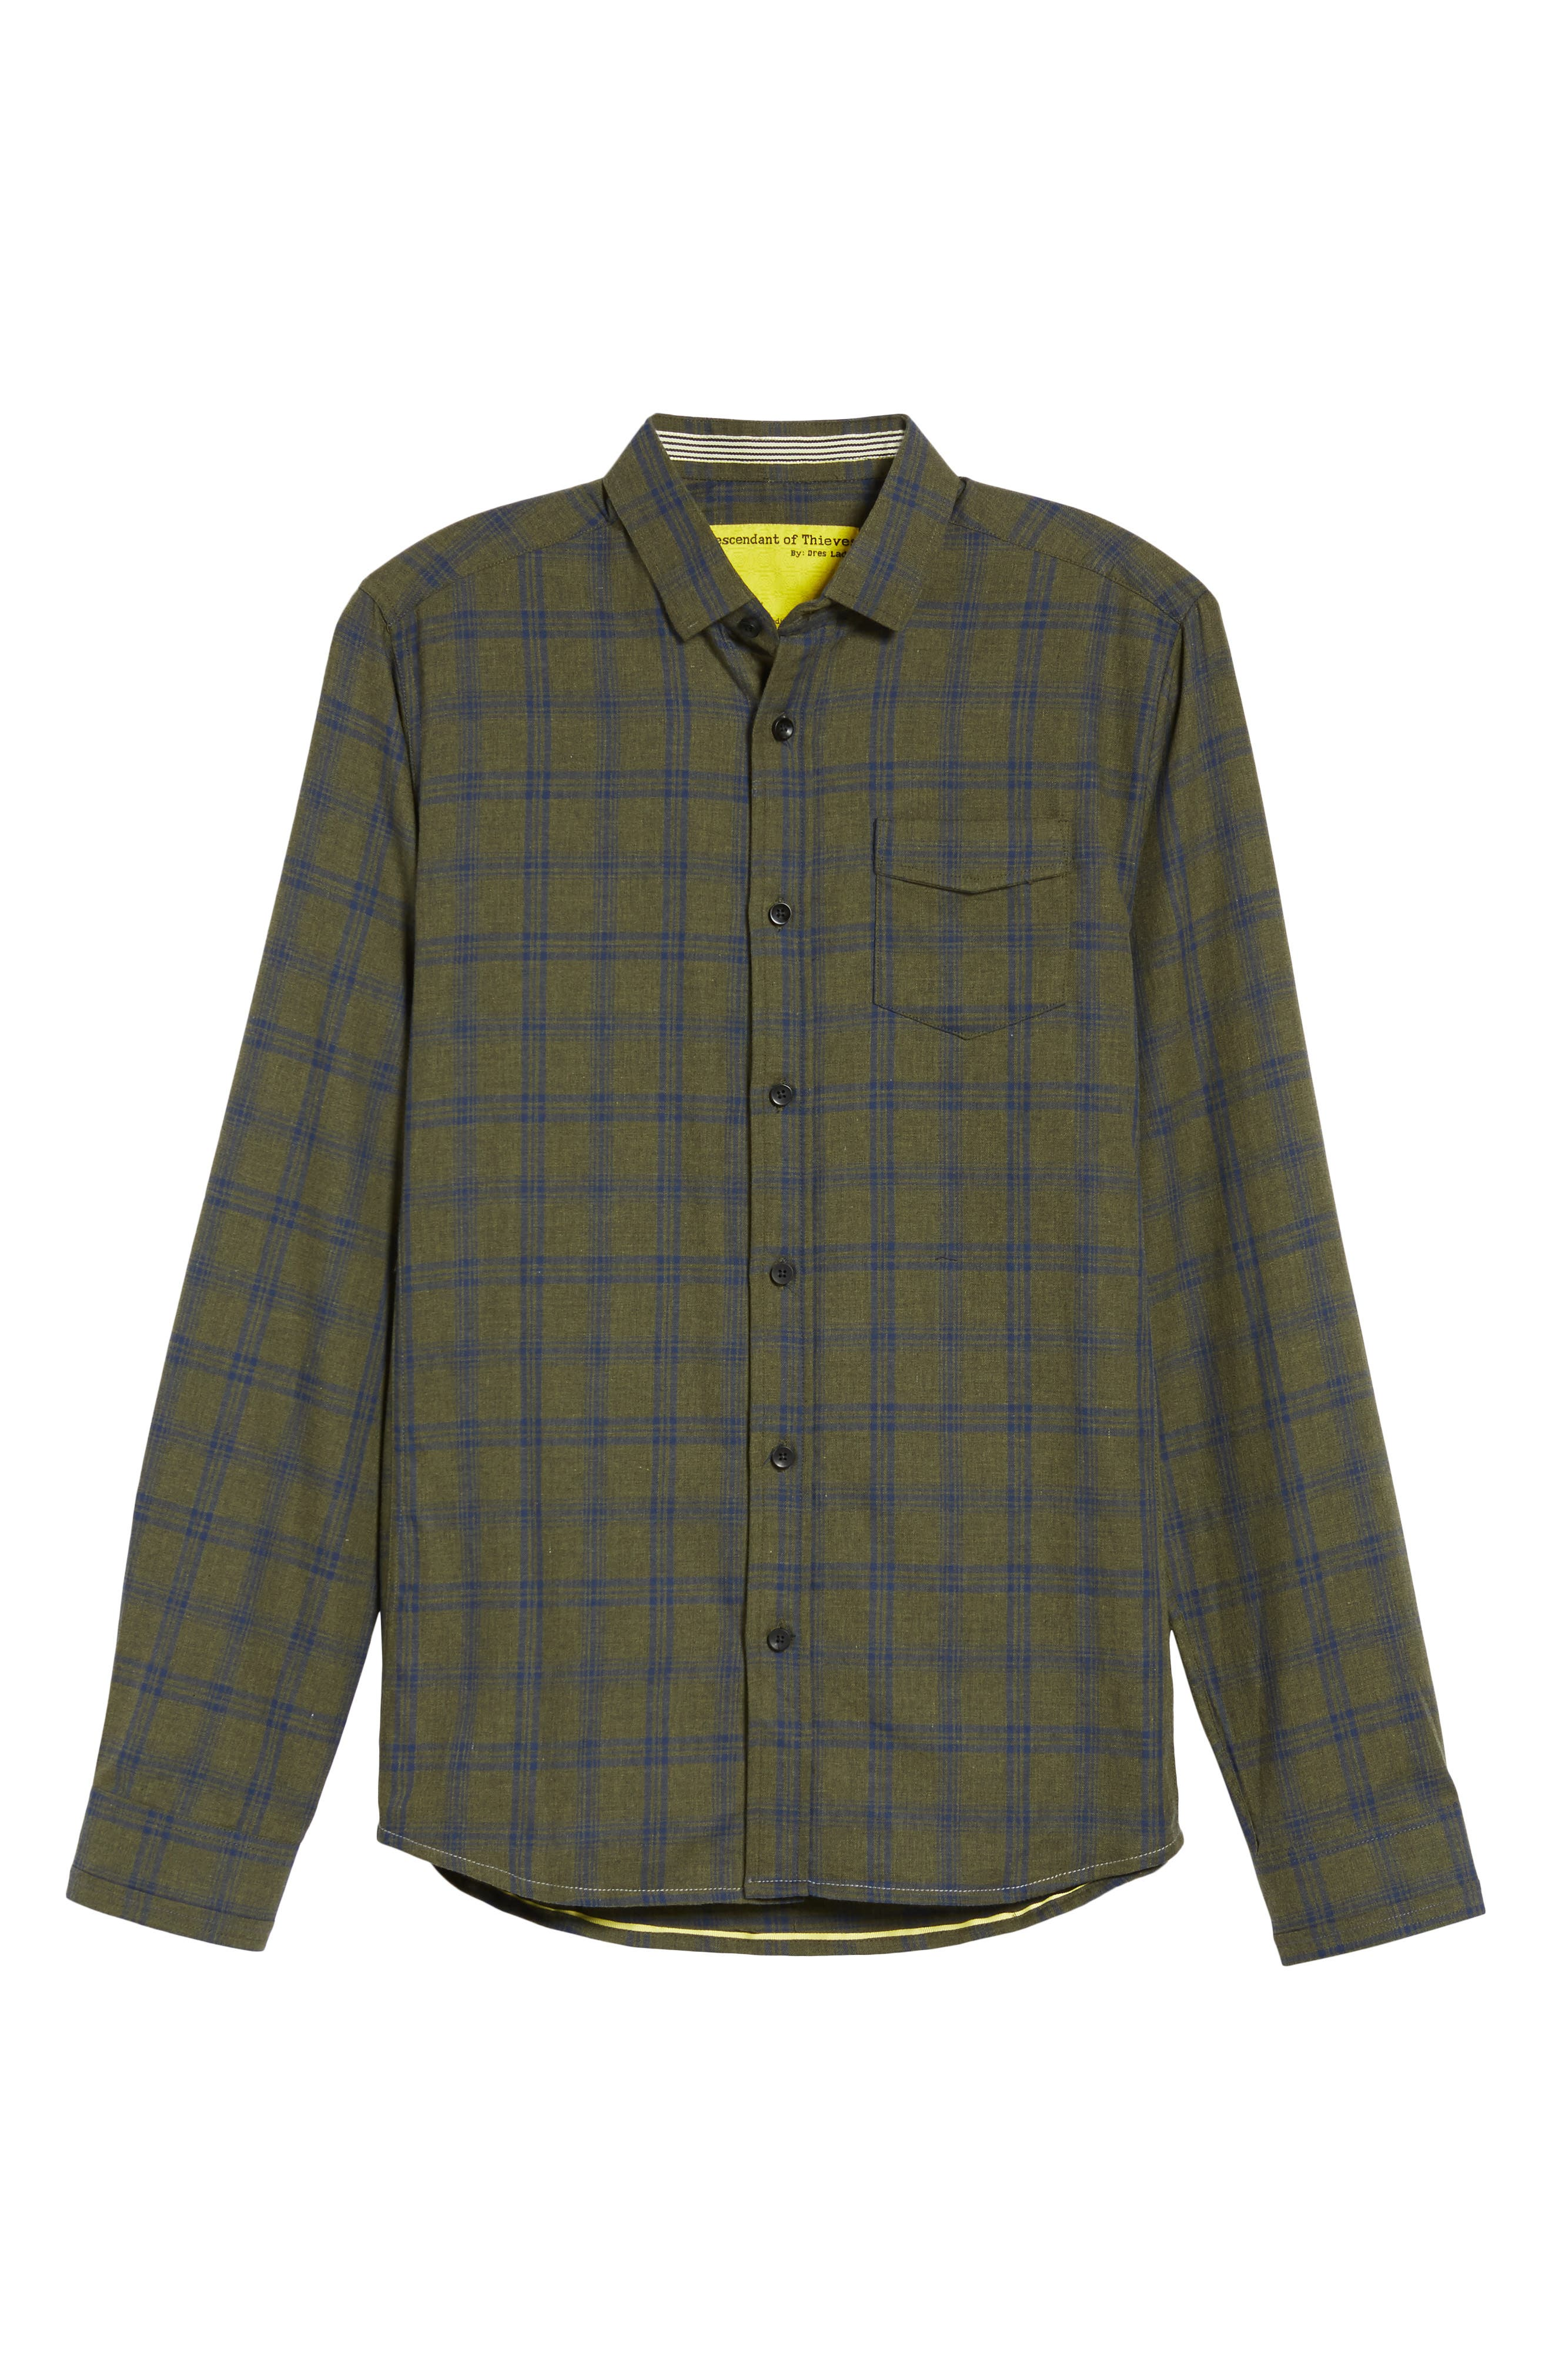 Alternate Image 6  - Descendant of Thieves Vintage Army Plaid Sport Shirt